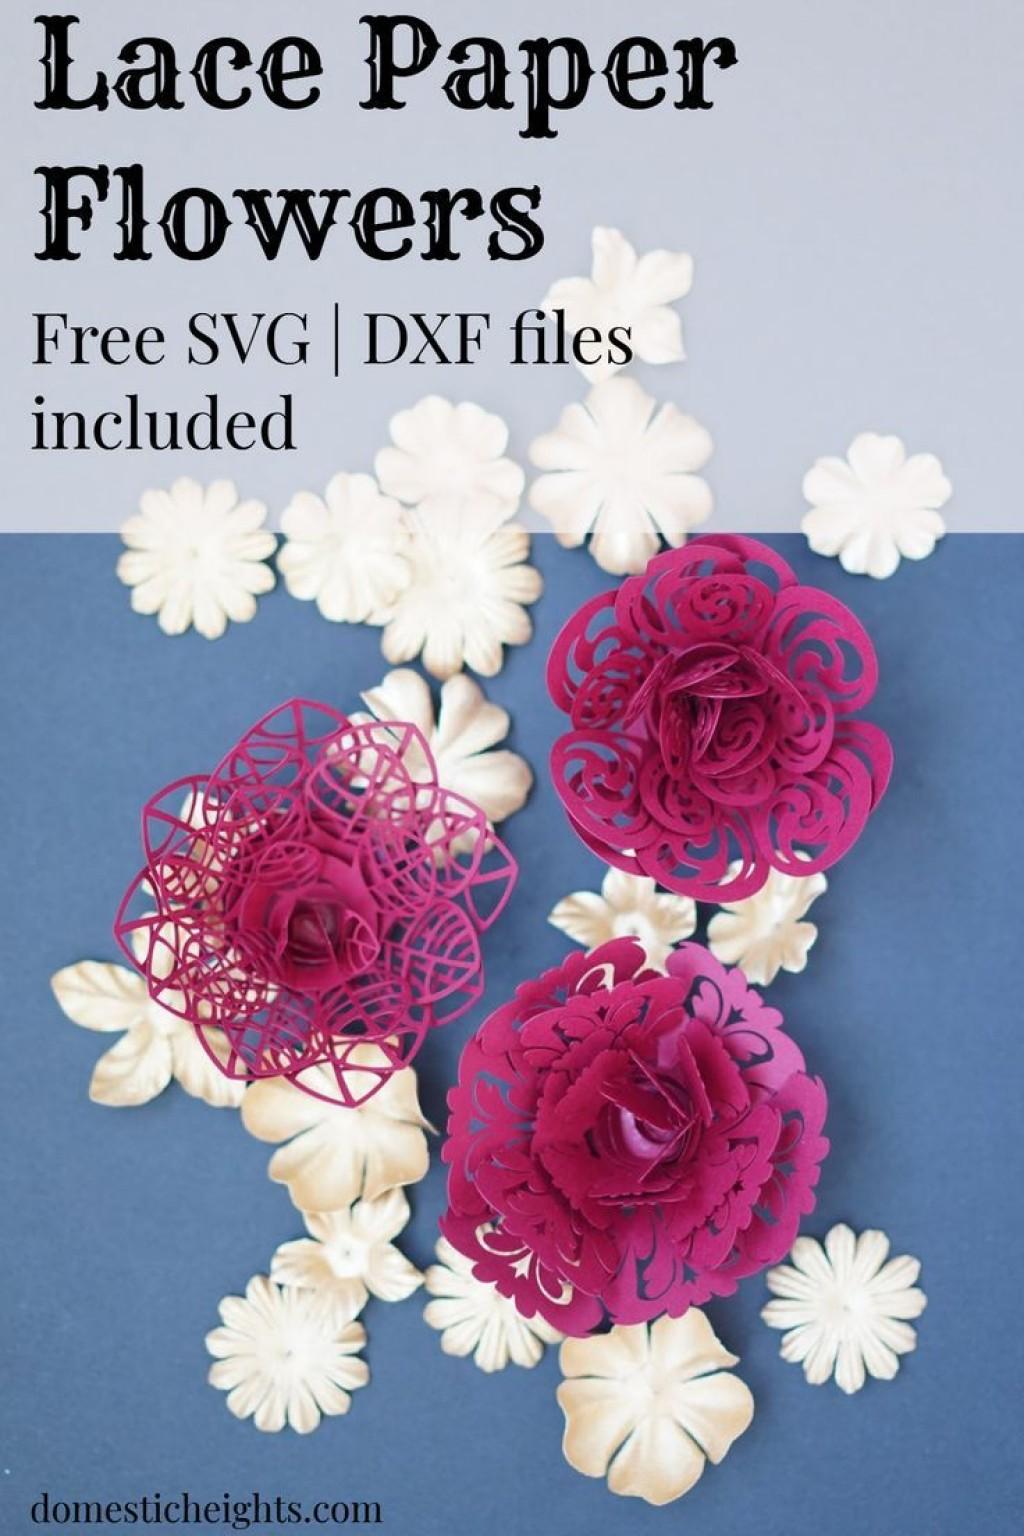 005 Fascinating Paper Flower Template Free Sample  Rolled Svg Rose Cricut PdfLarge